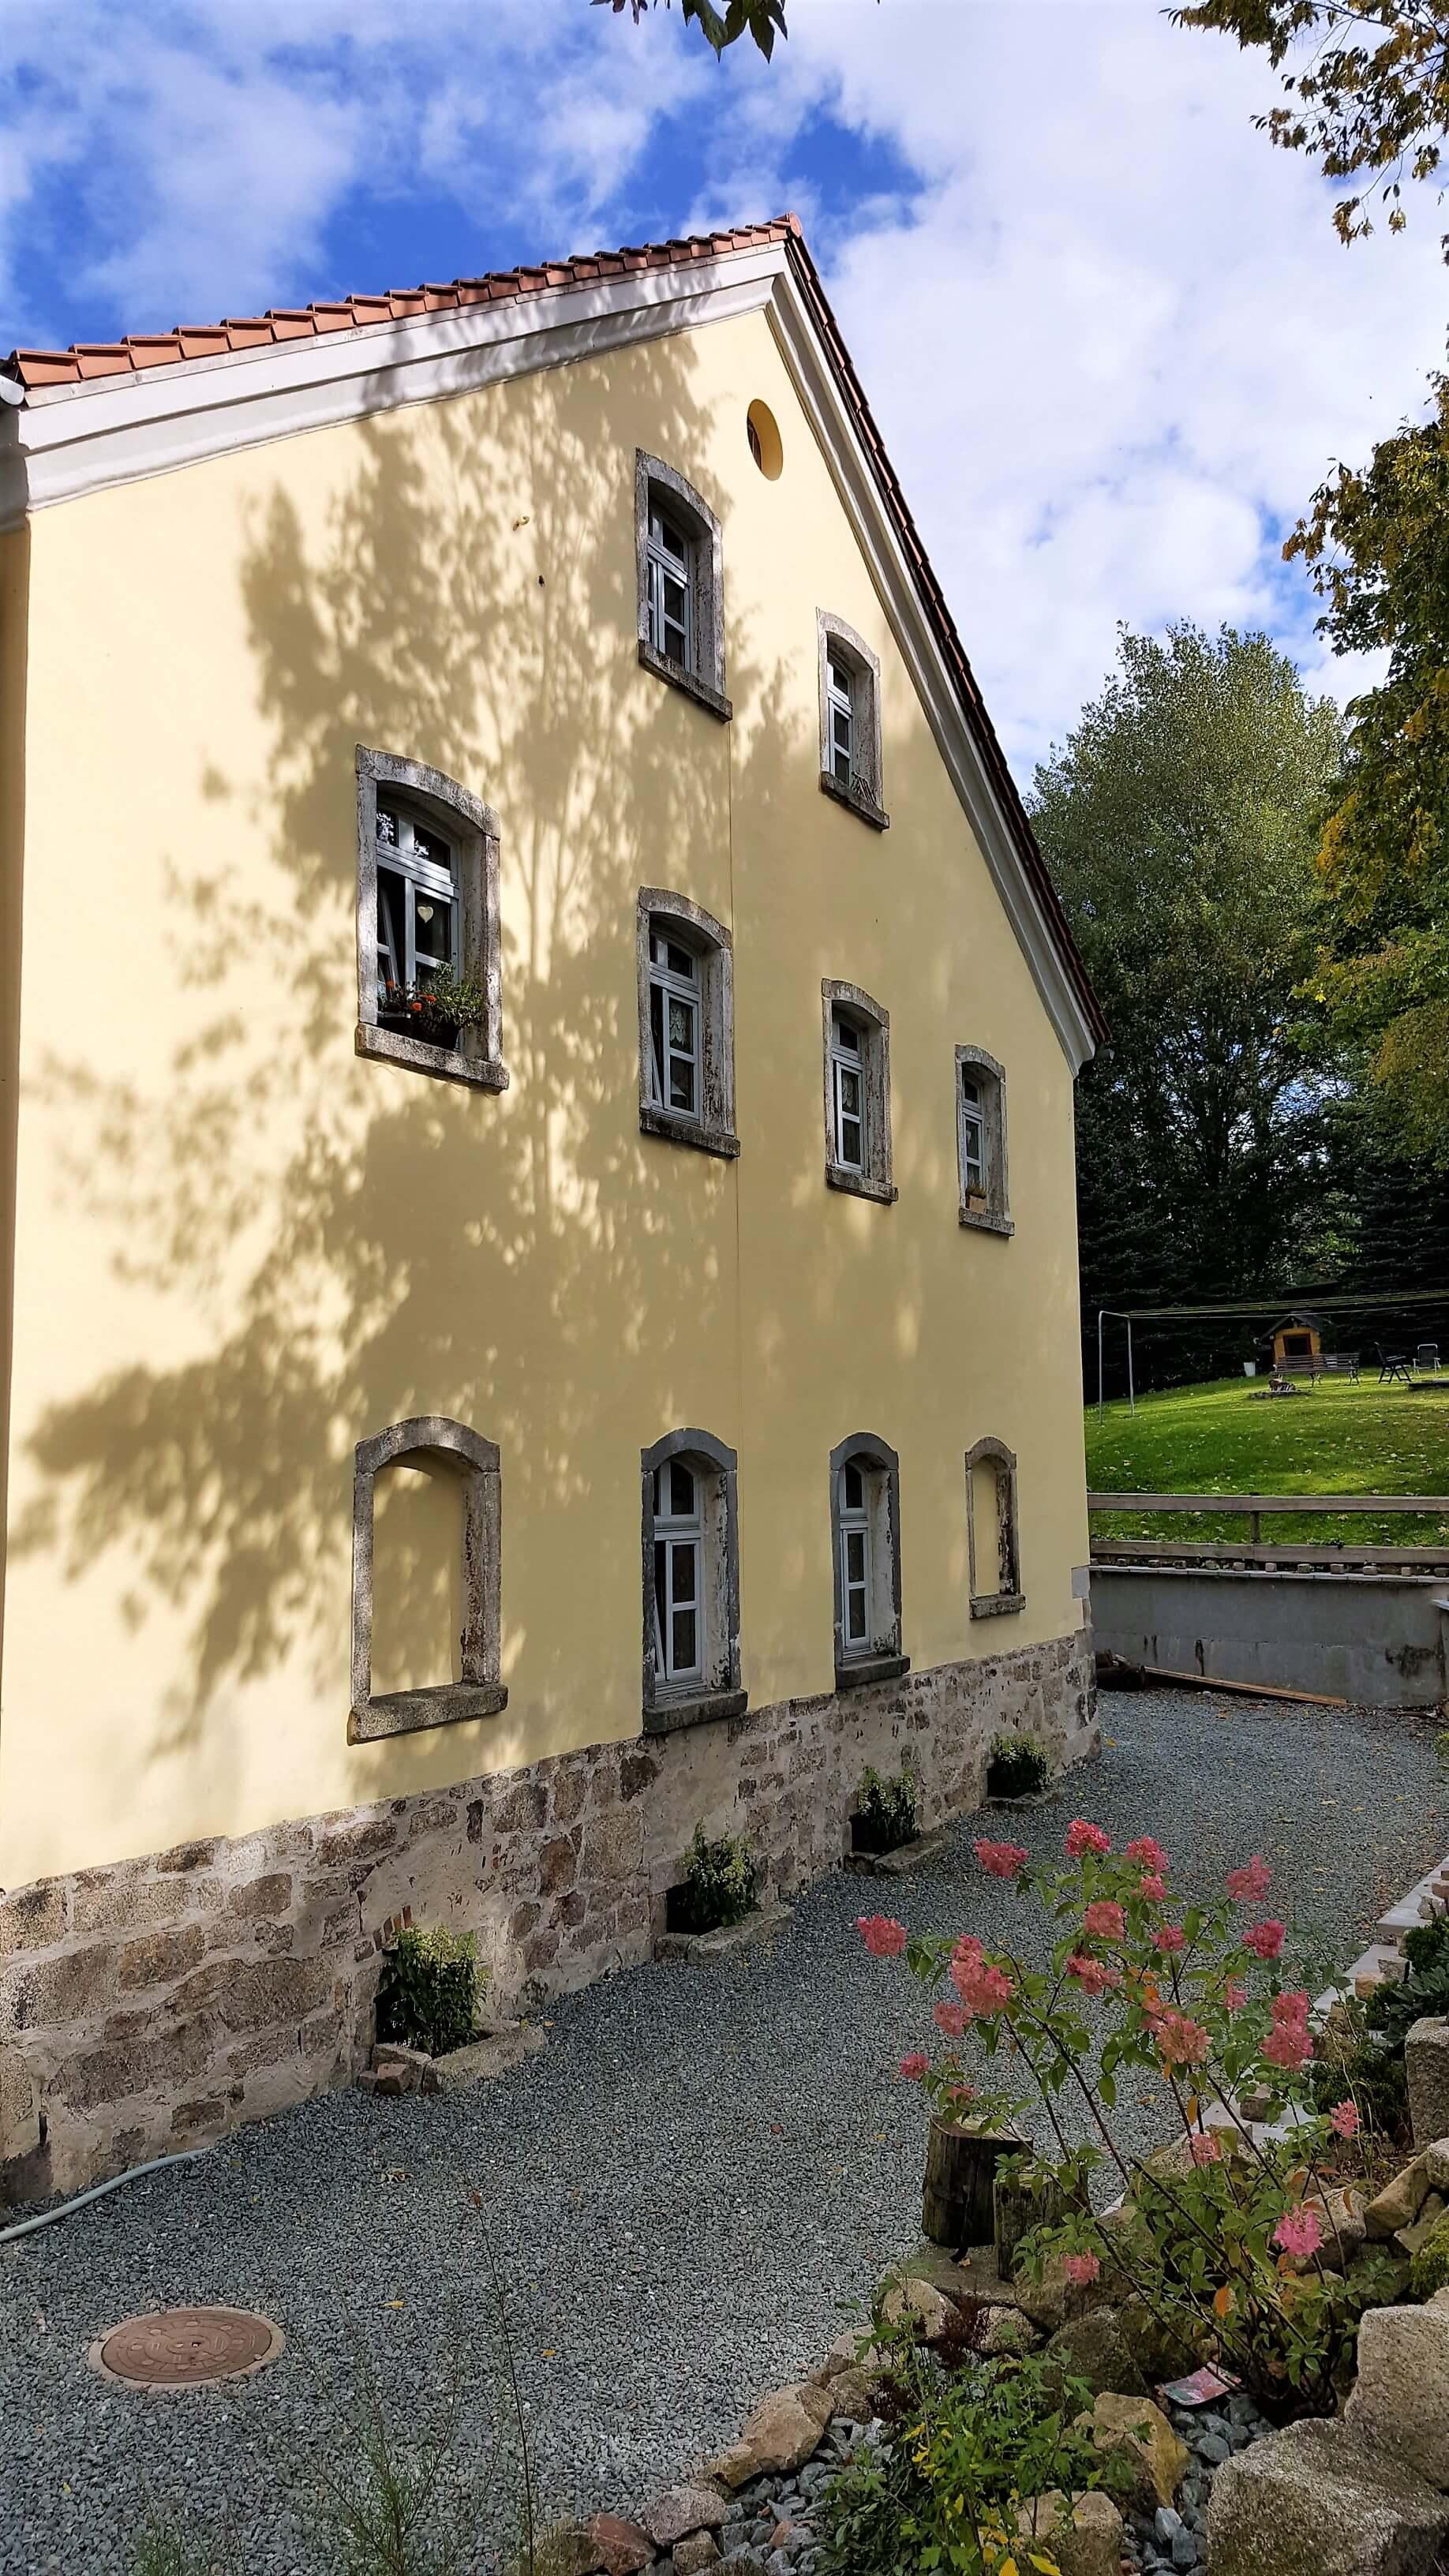 Rittergut Adlershof zu Oberlauterbach - Giebel Gutsverwalterhaus © Jens Reiher